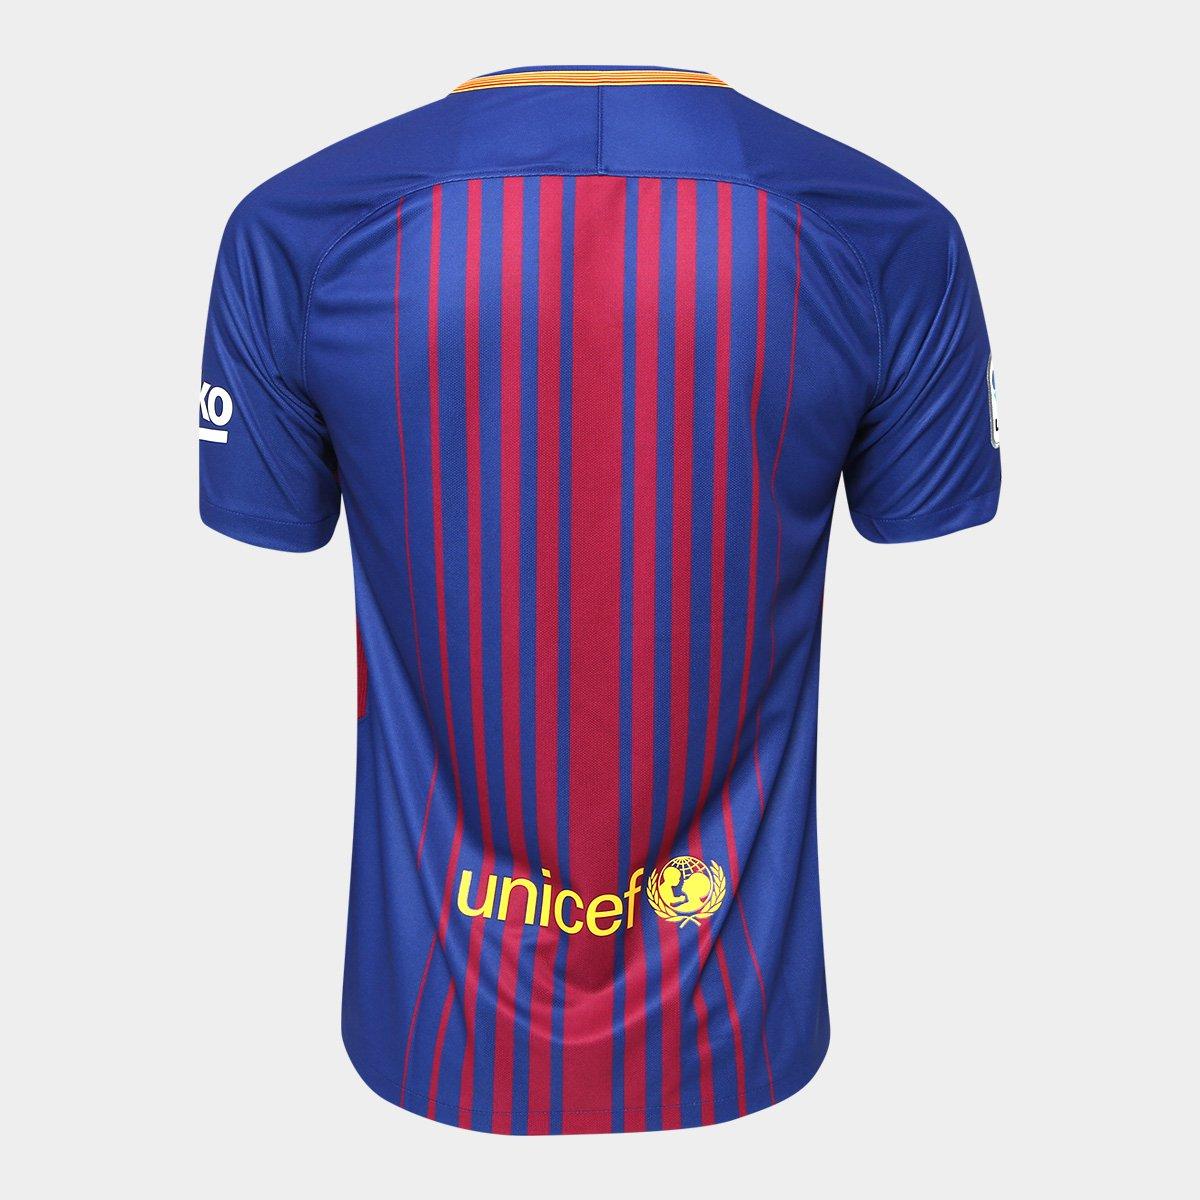 dc76d3a973 Camisa Barcelona Home 17 18 s nº Torcedor Nike Masculina - Azul ...